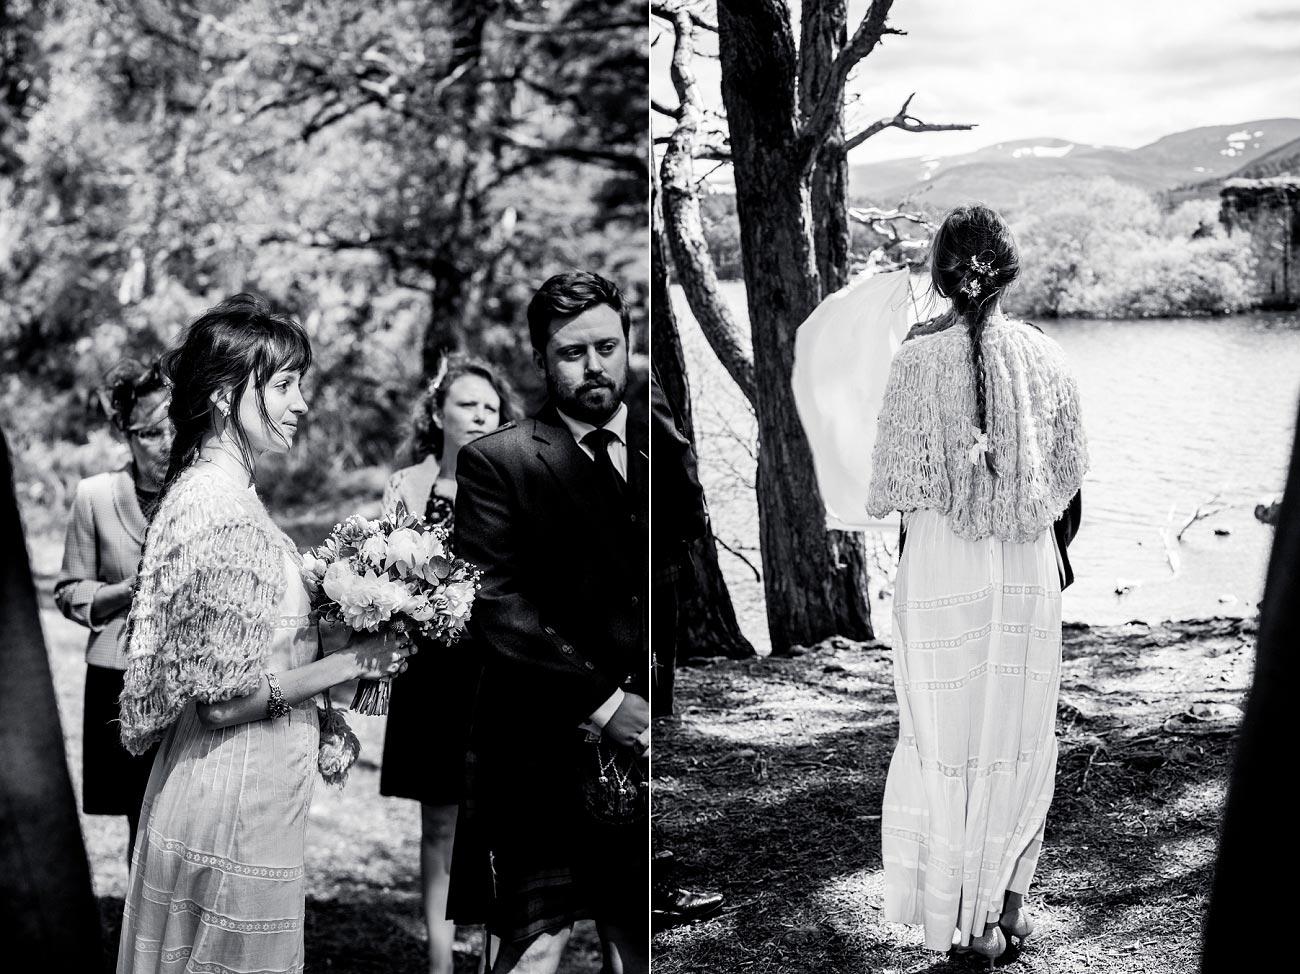 black and white wedding photography, woodland handfast ceremony, Cairngorms, Scottish Highlands